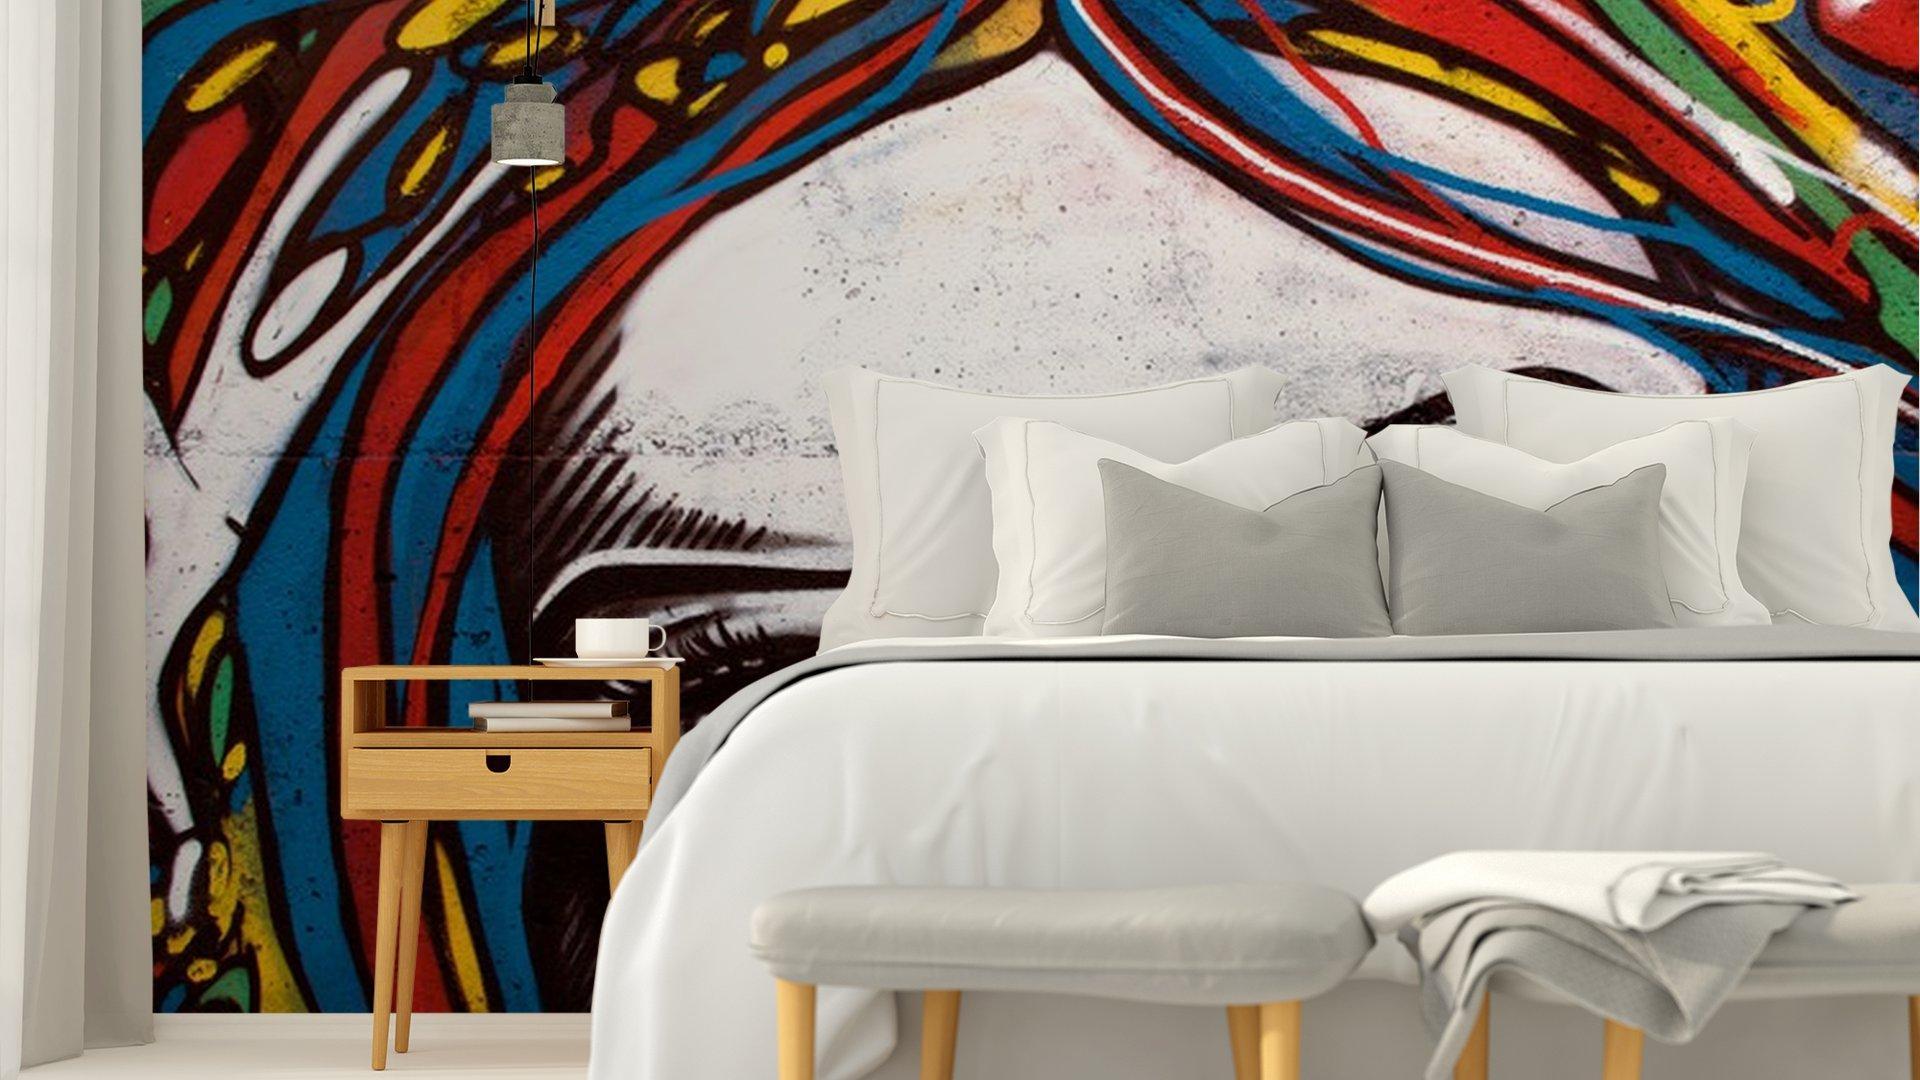 EL GRAFFITI DE ESTILO MODERNO EN LA PARED DE LADRILLO.4 - Fotomural Tapiz Moderno Rostro en Muro Tipo Graffiti